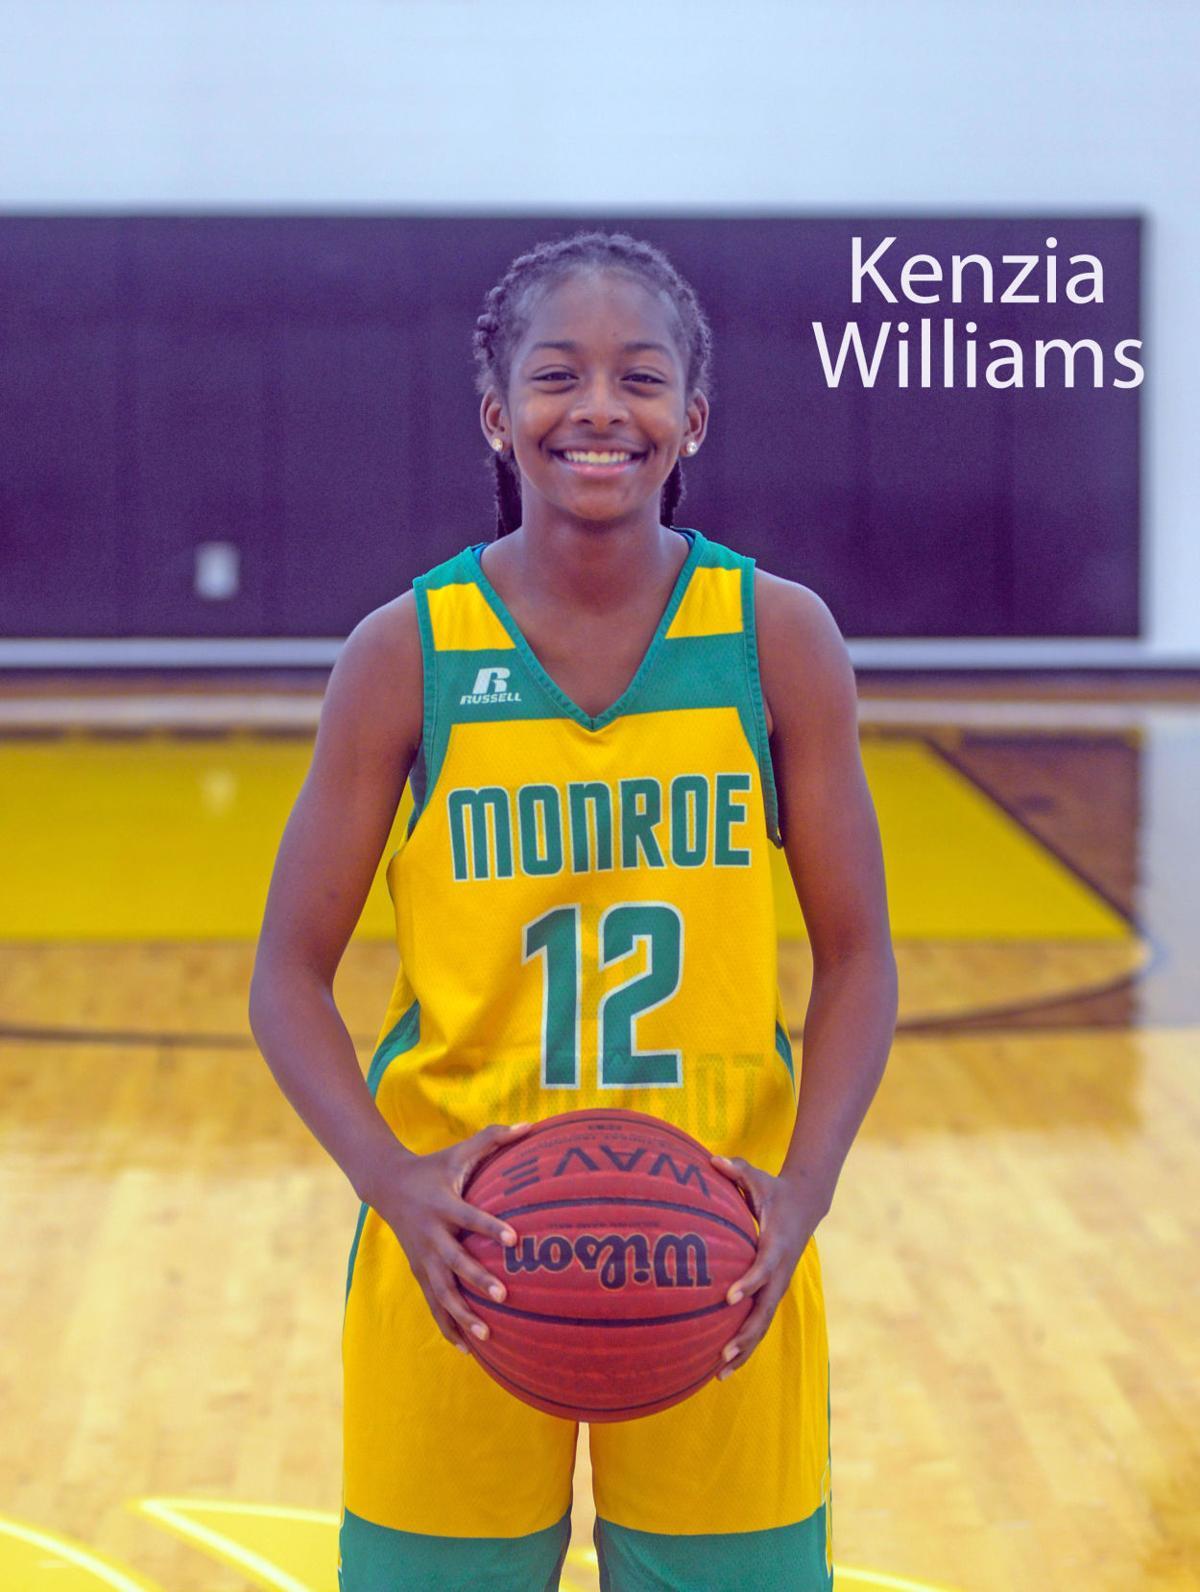 2 Kenzia Williams.jpg